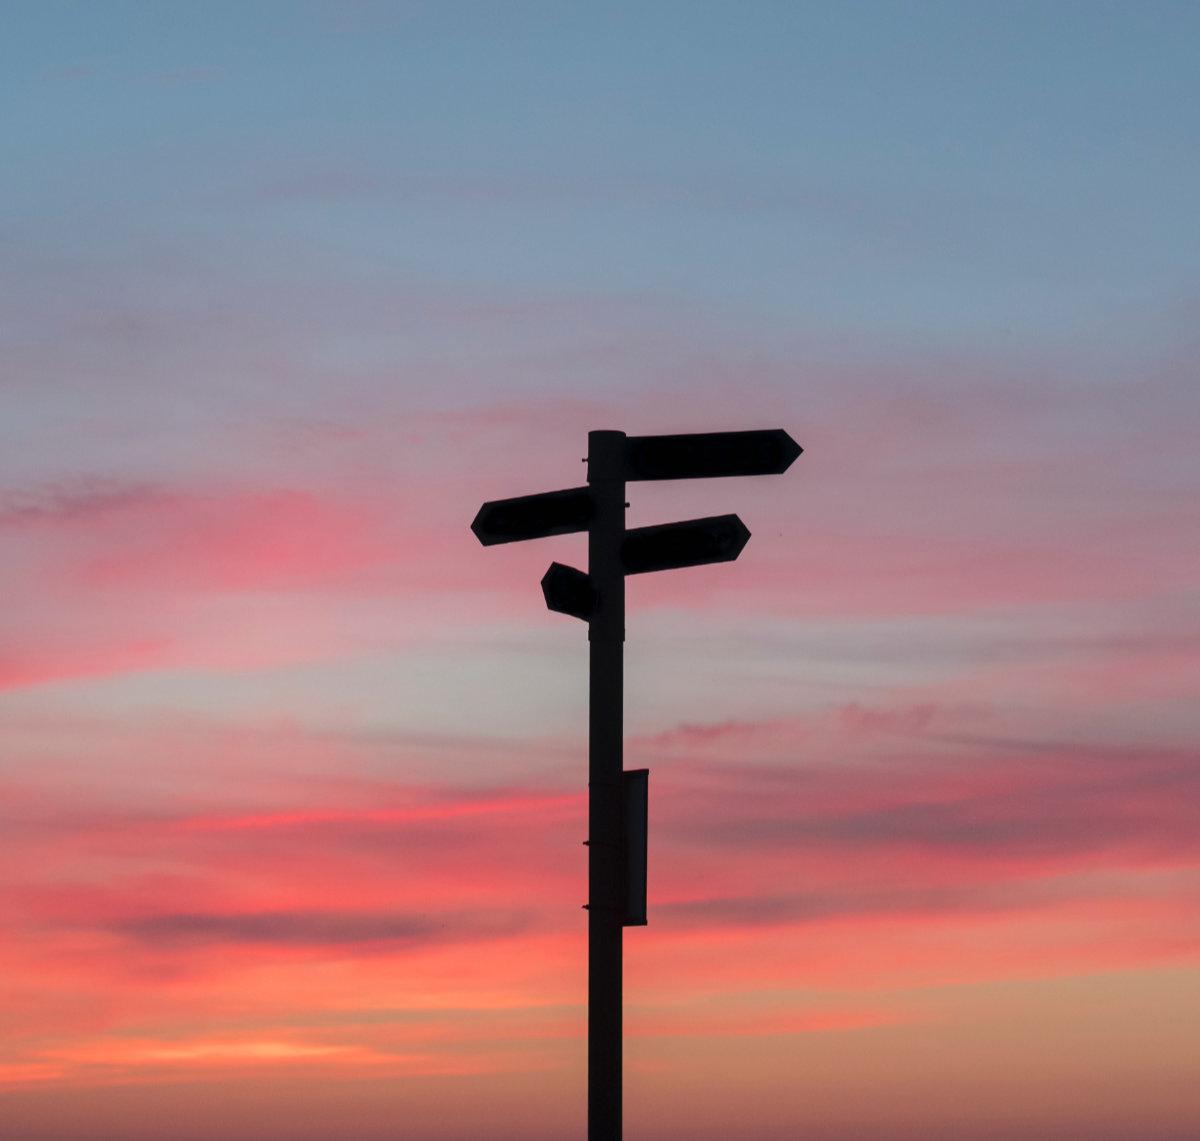 uncertain direction - a signpost at dusk